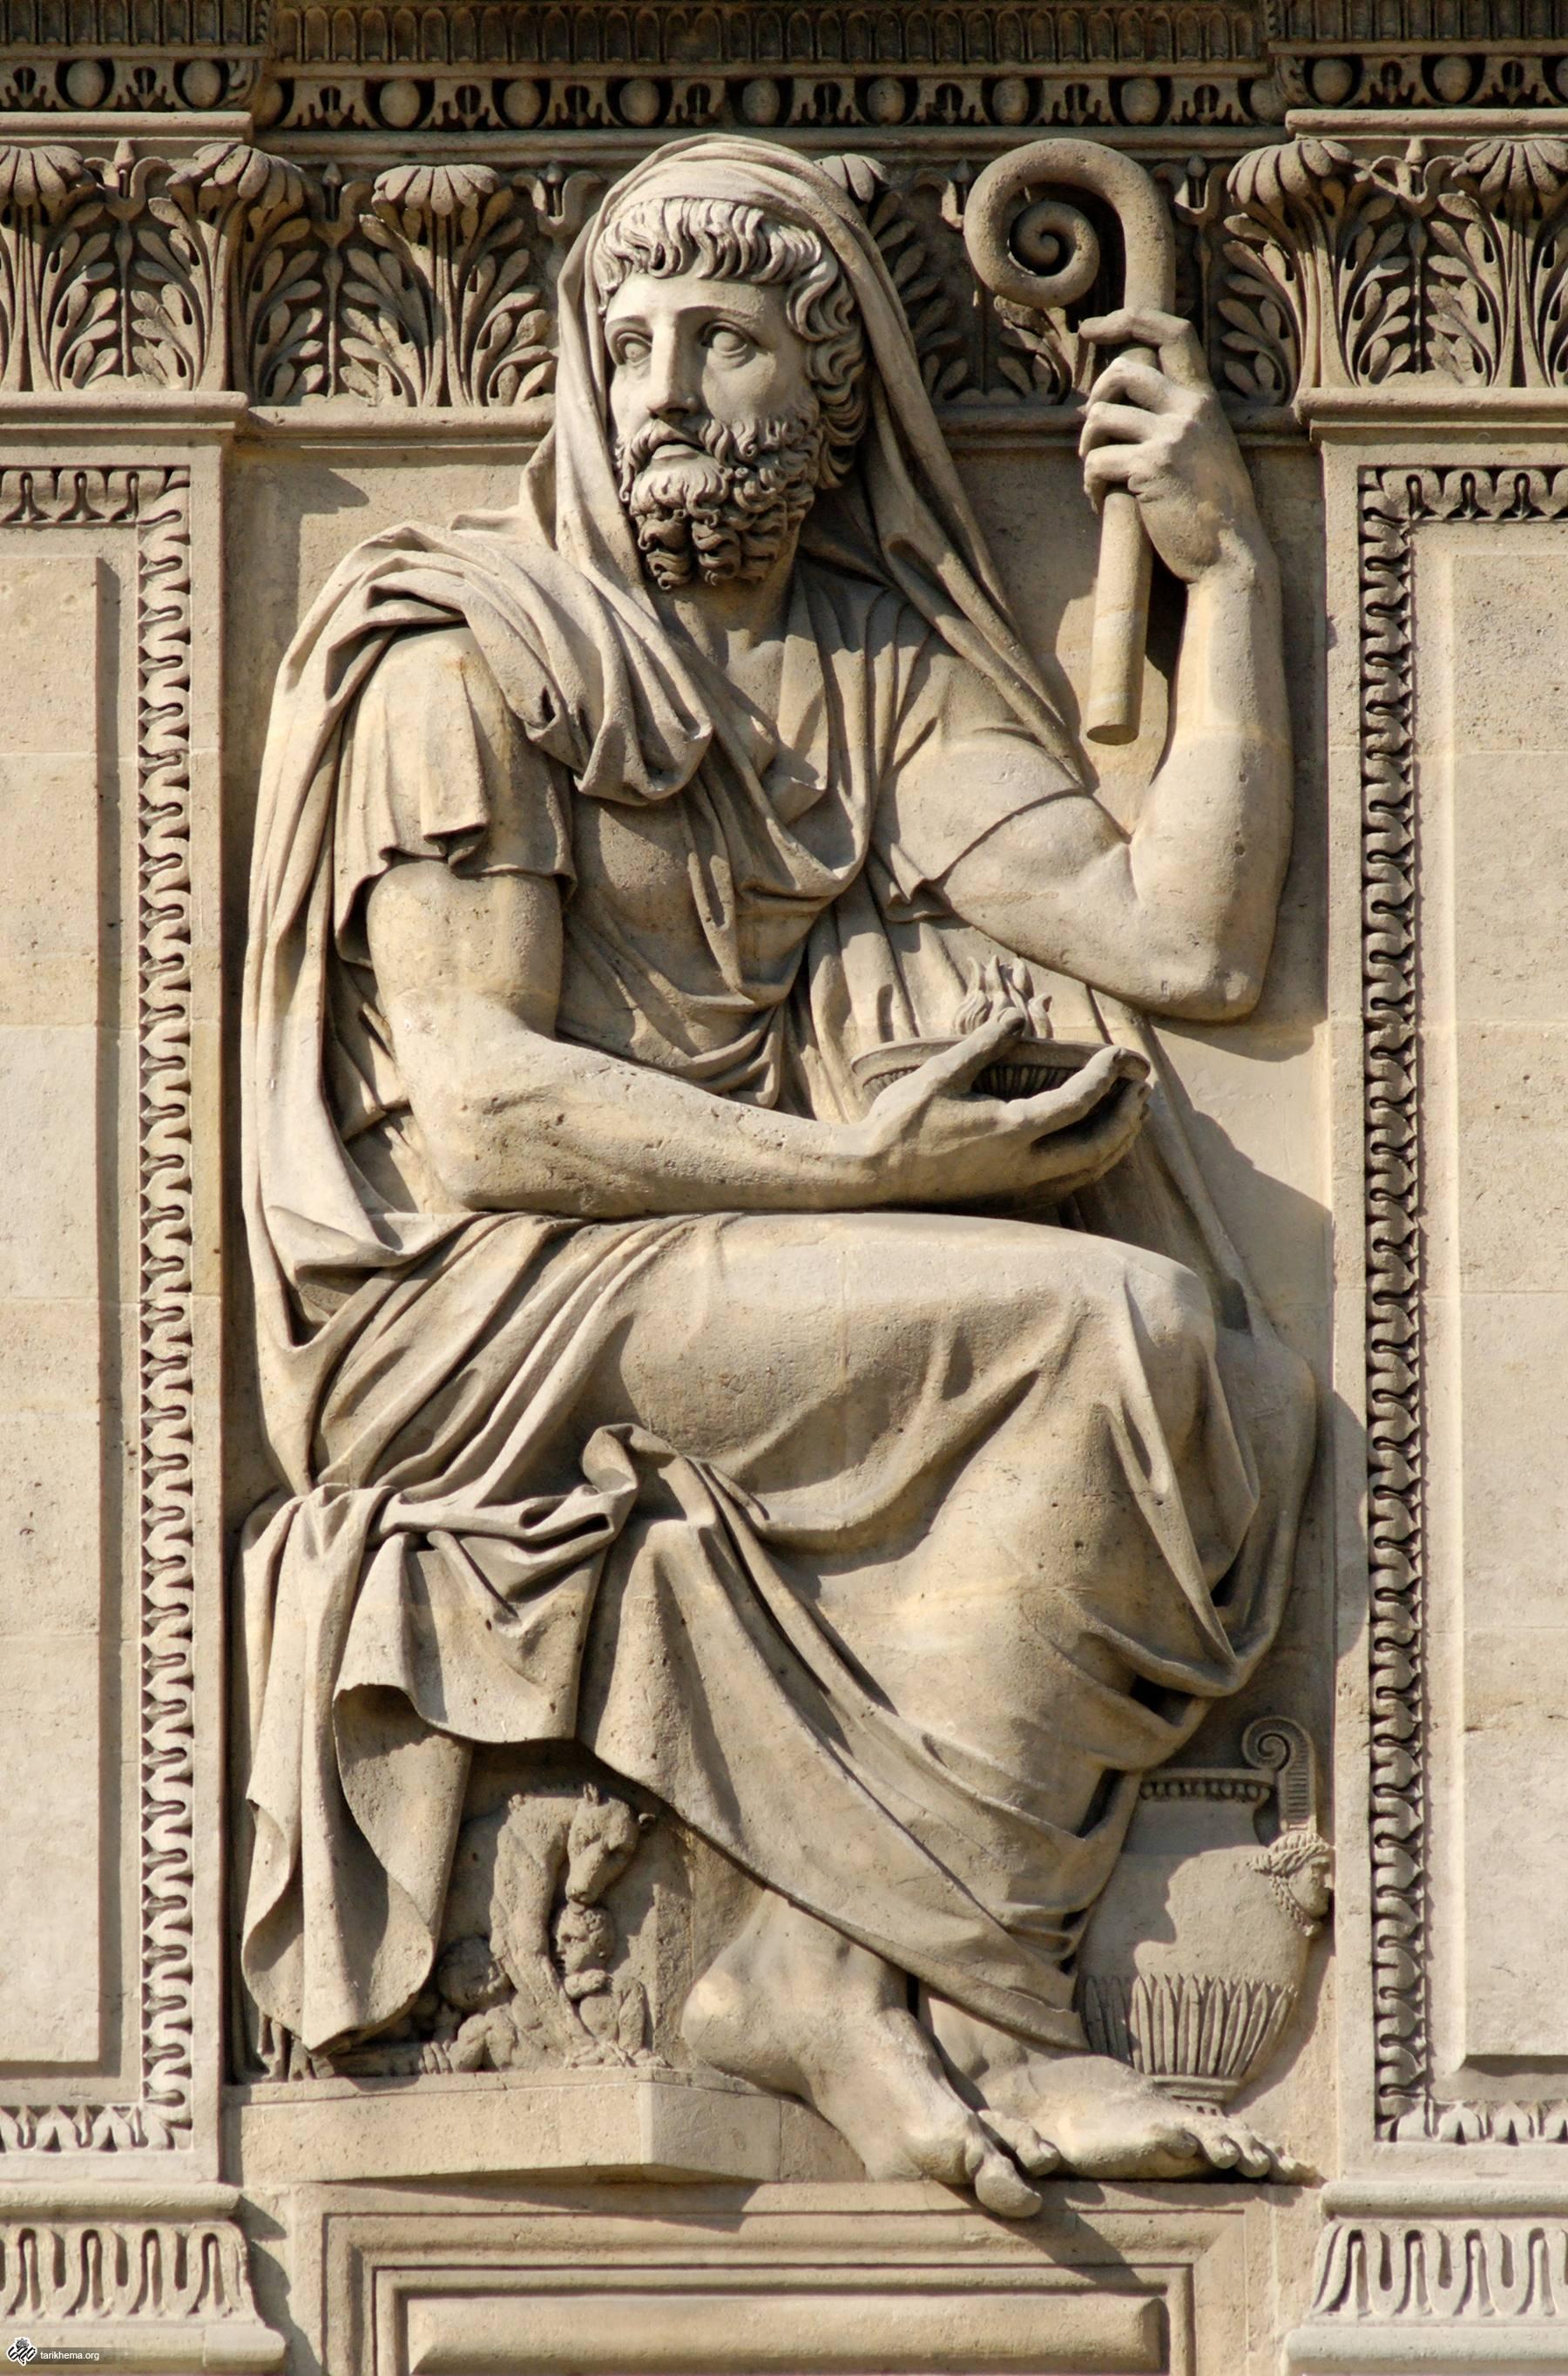 Relief_Herodotus_cour_Carree_Louvre.jpg (1800×2727)